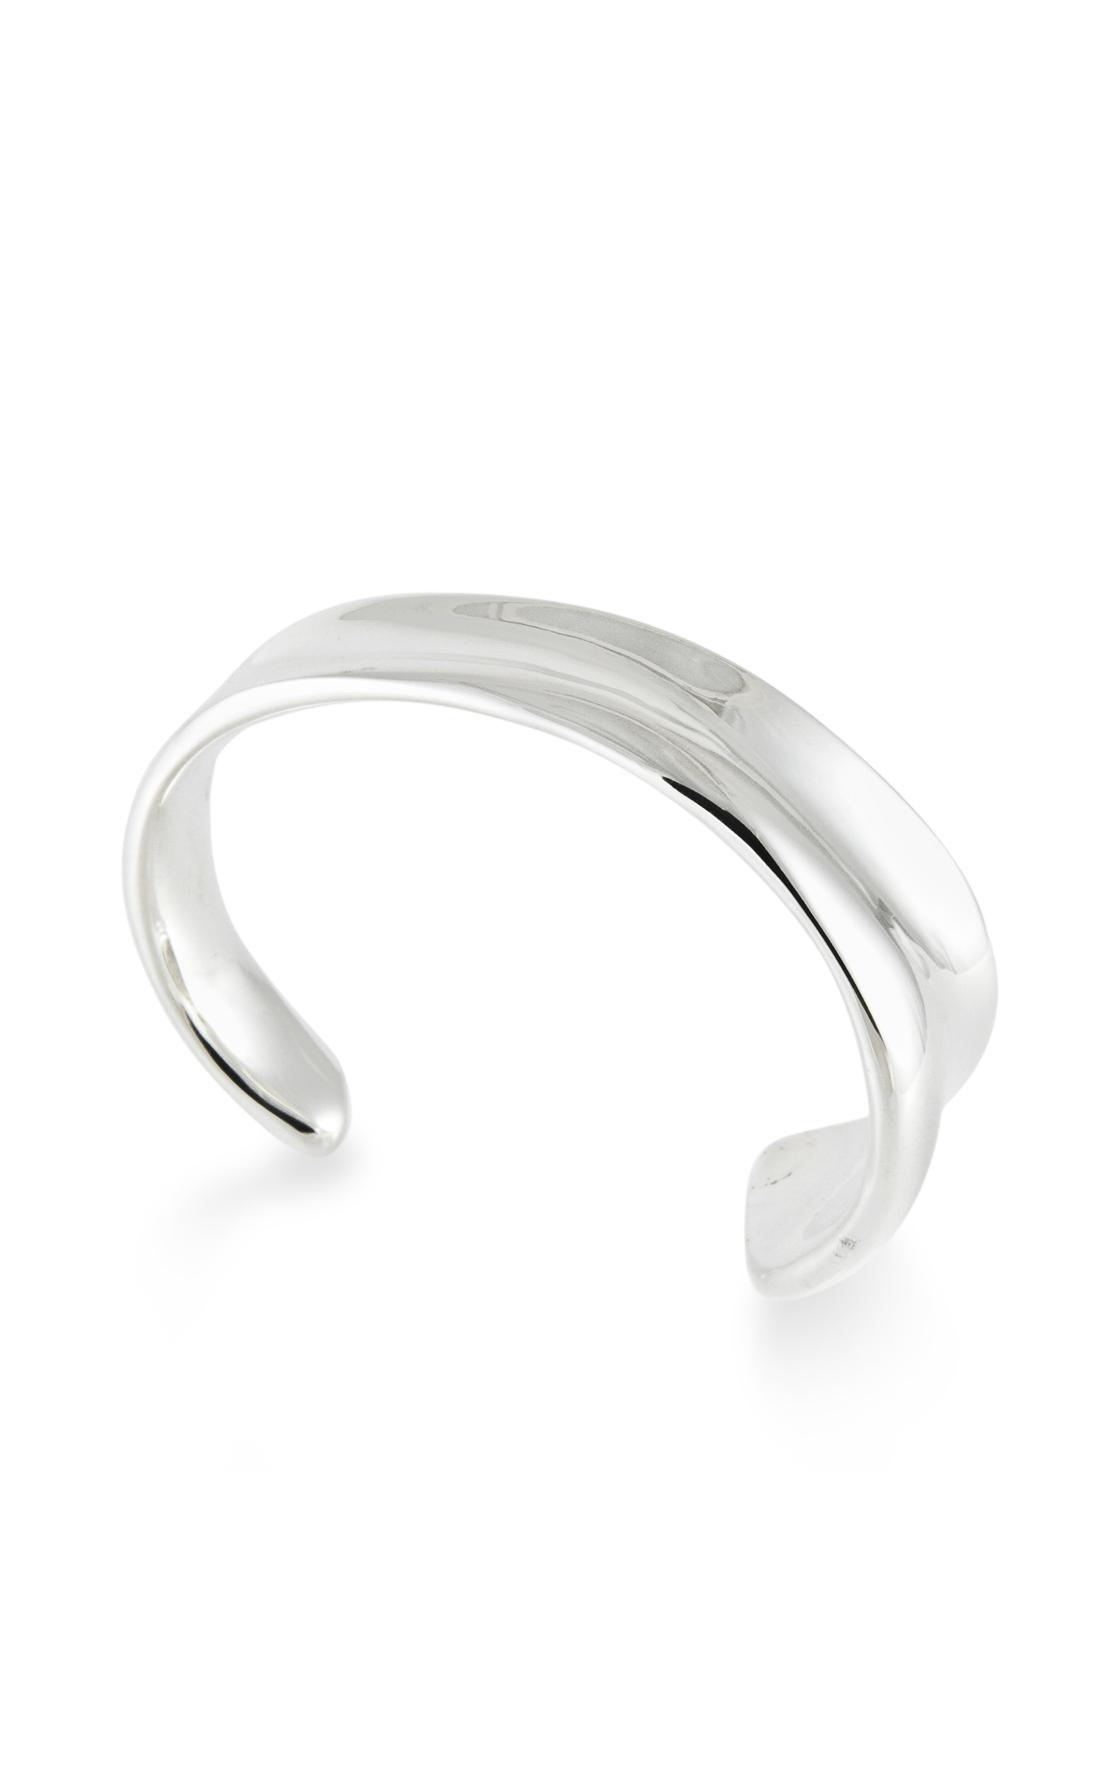 Zina Contemporary Bracelet A106 product image